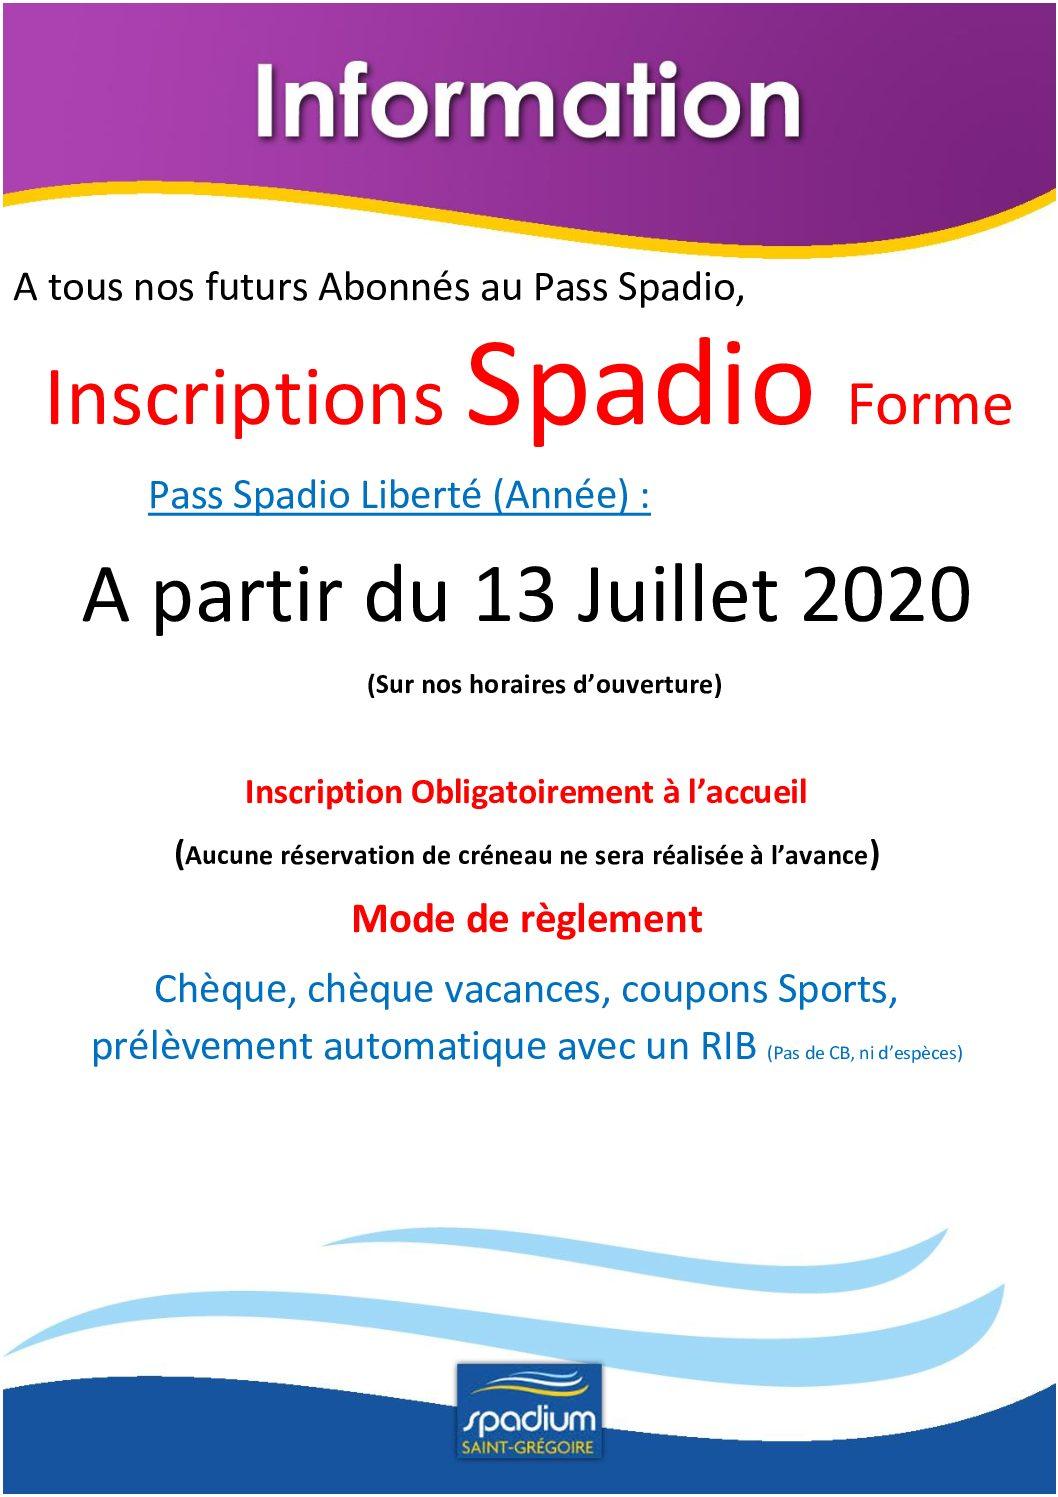 Inscriptions Spadio Liberté 2020/2021